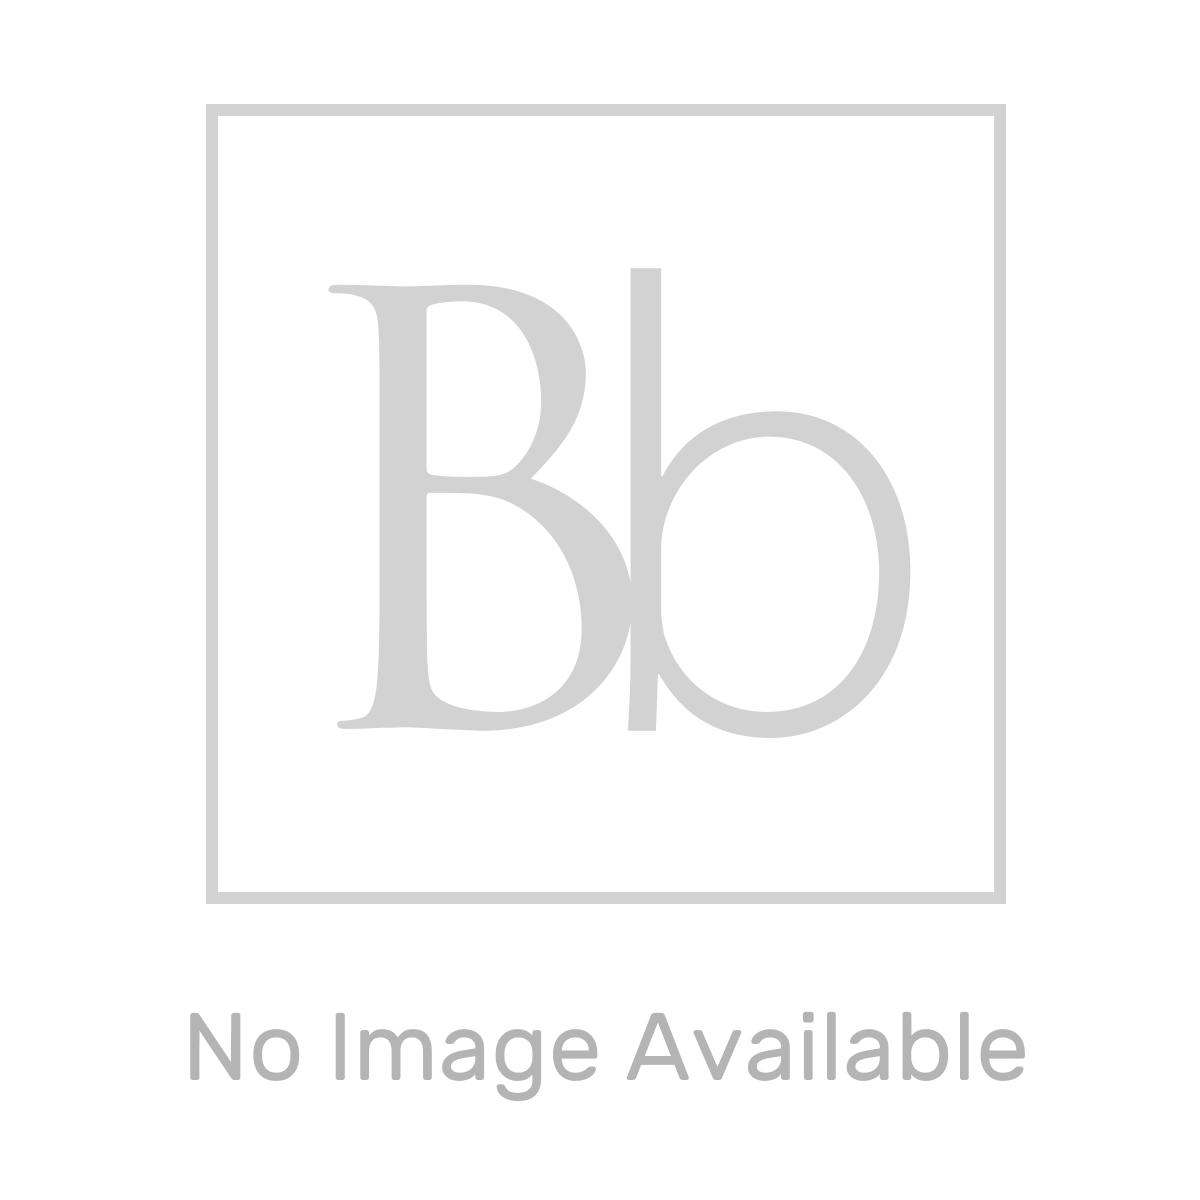 RAK Ecofix Chrome Flush Plate with Surrounded Rectangular Push Buttons